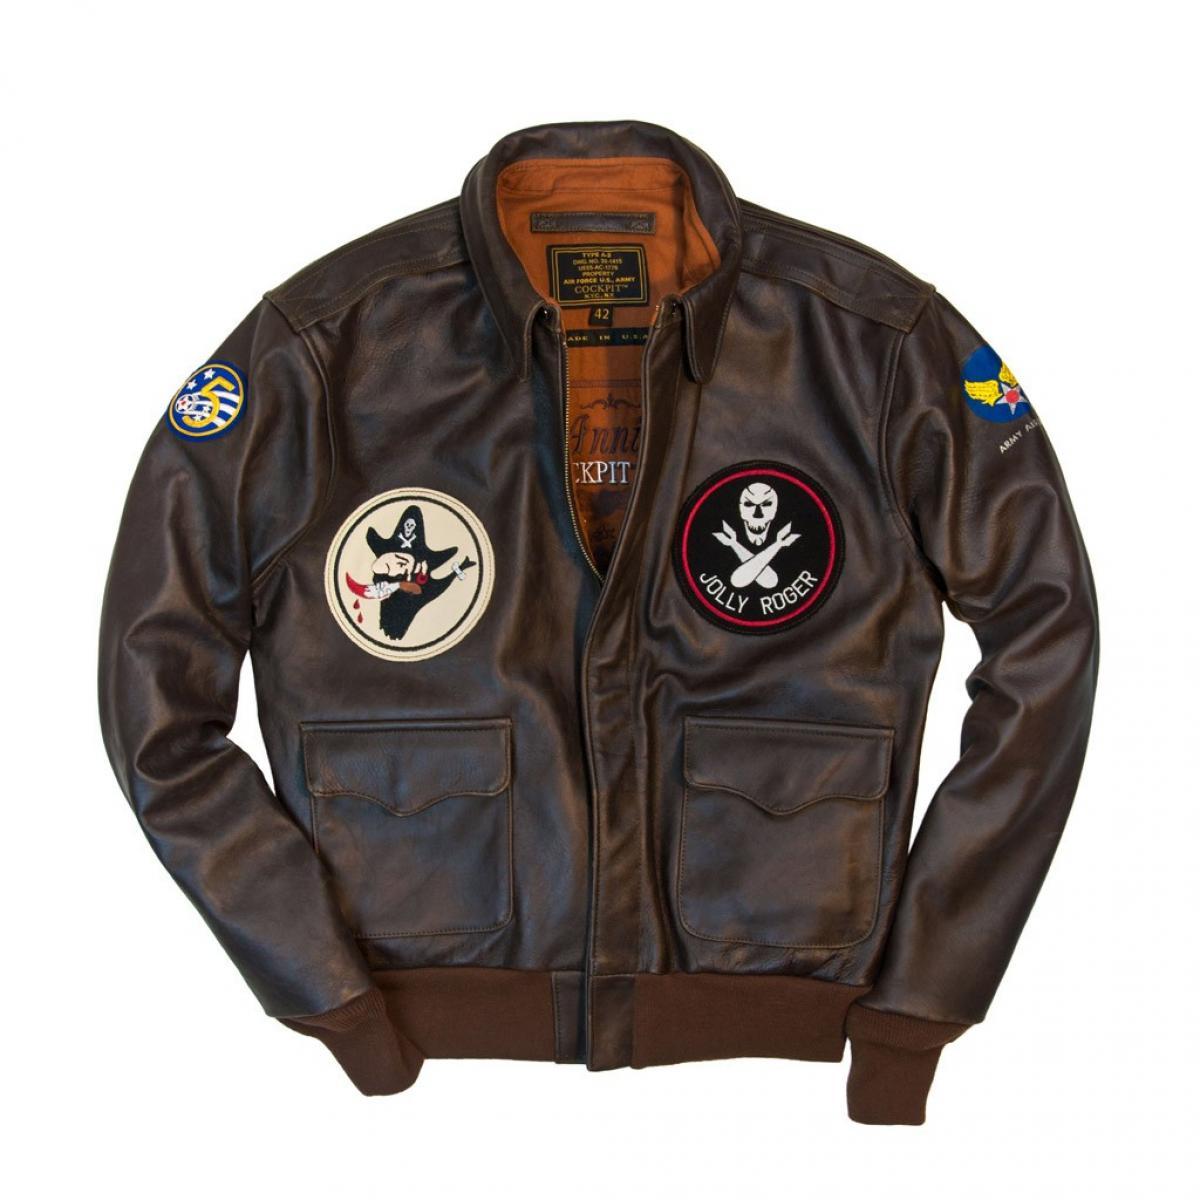 Chaqueta Piloto. 40th Anniversary Bottoms Up A-2 Pinup Jacket